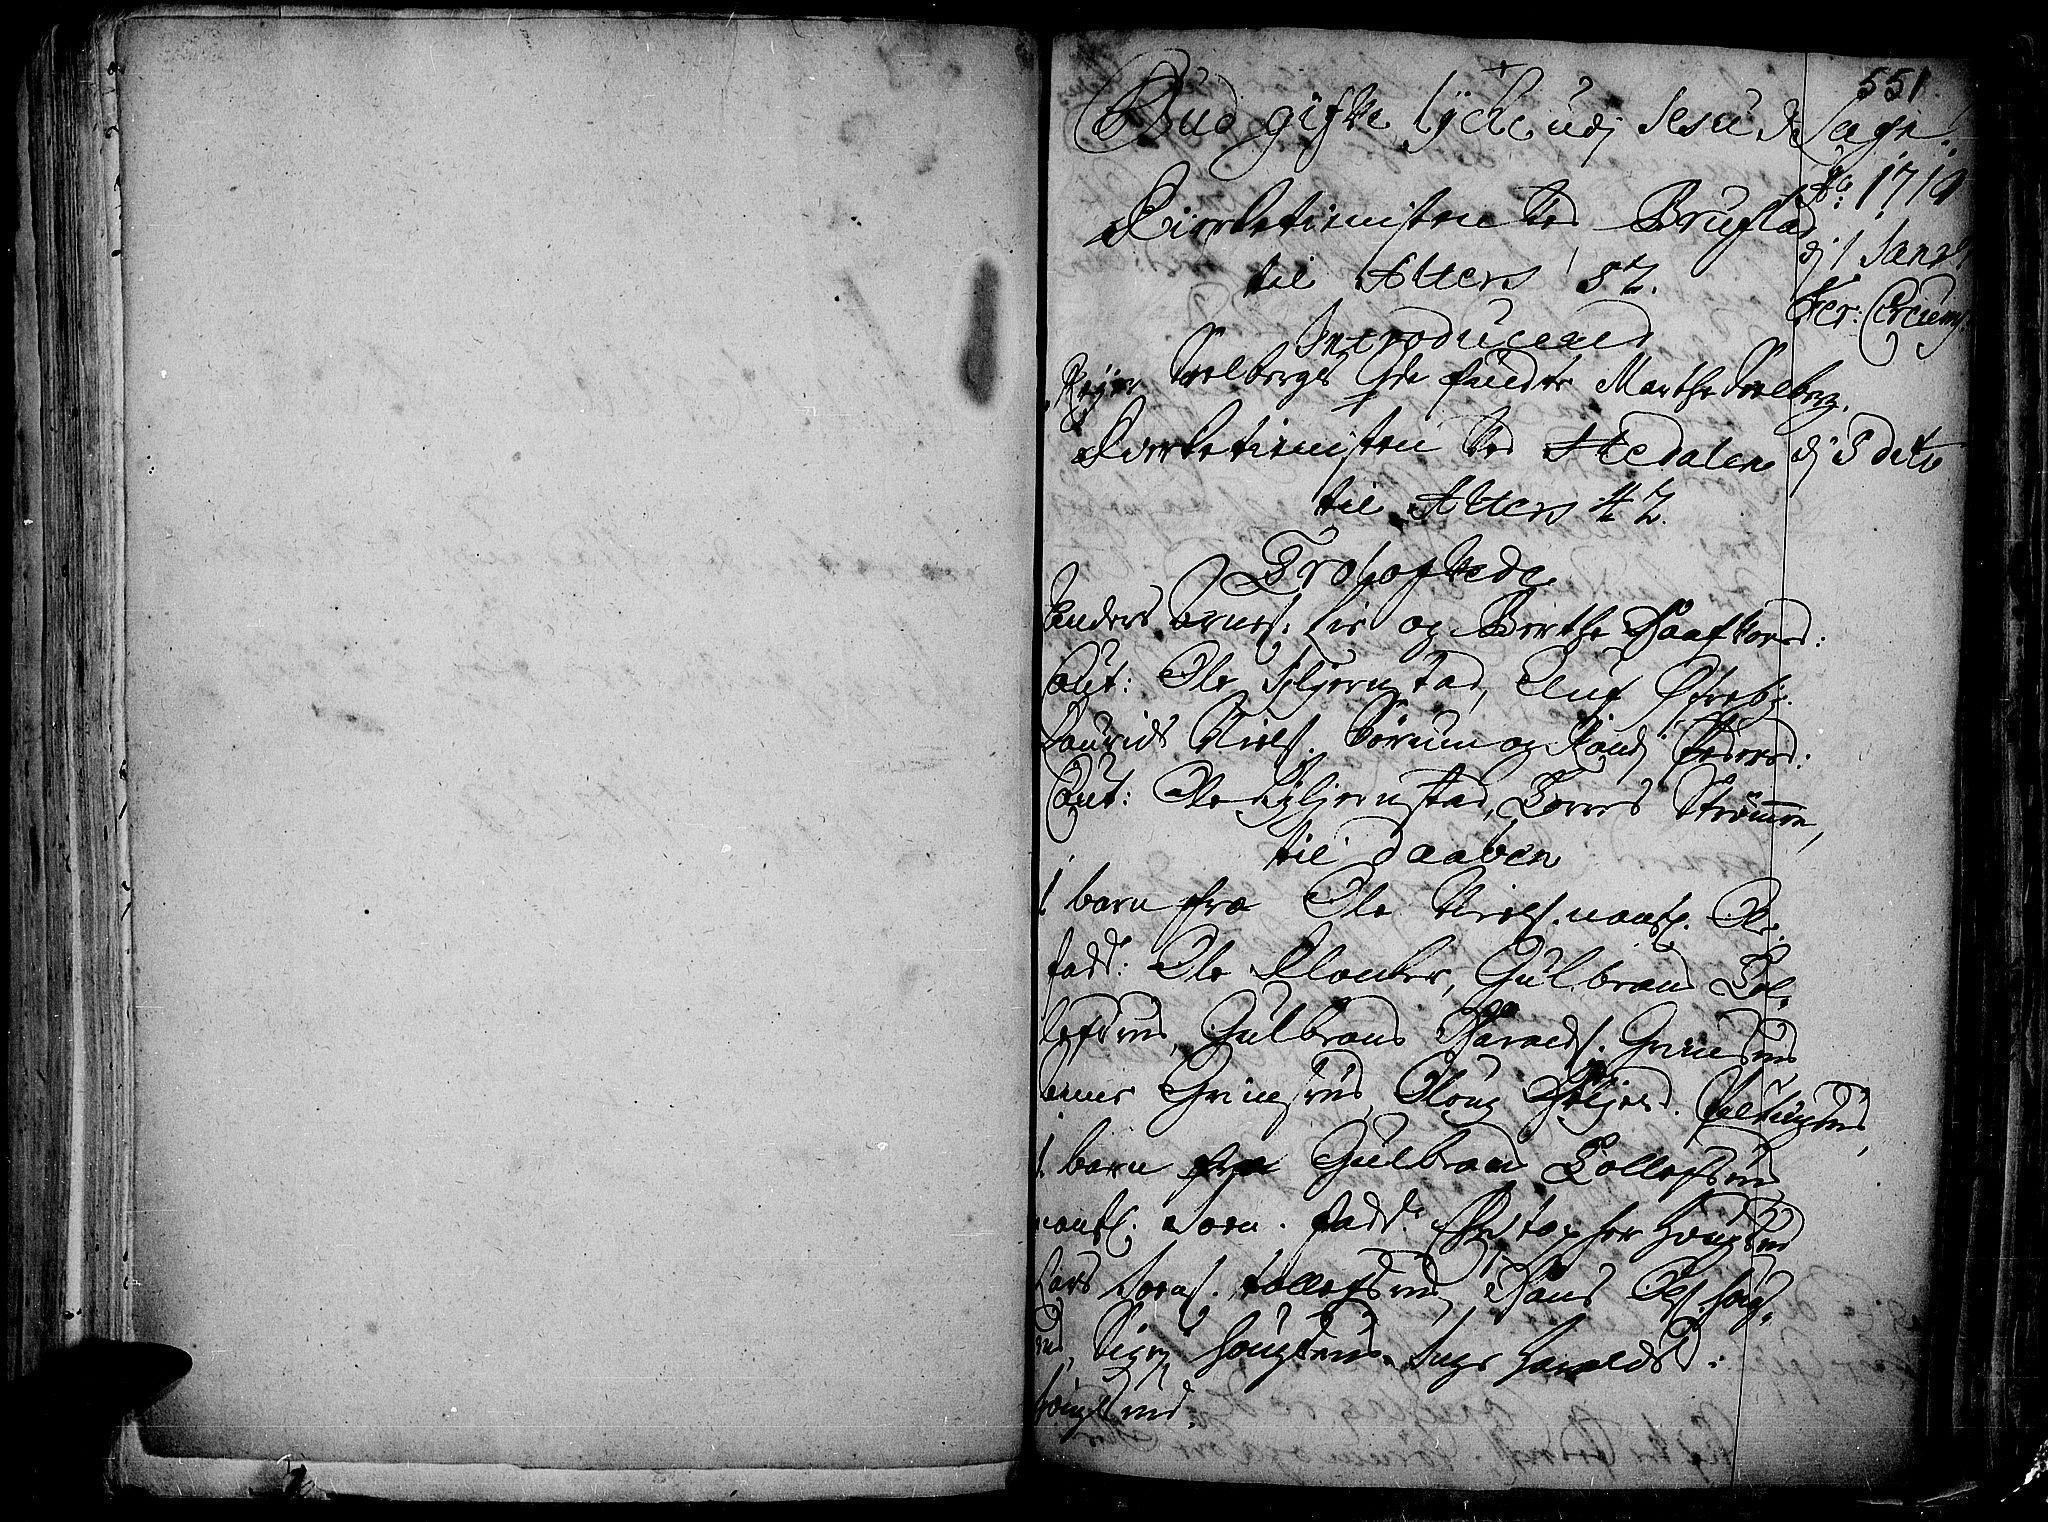 SAH, Aurdal prestekontor, Ministerialbok nr. 1-3, 1692-1730, s. 551